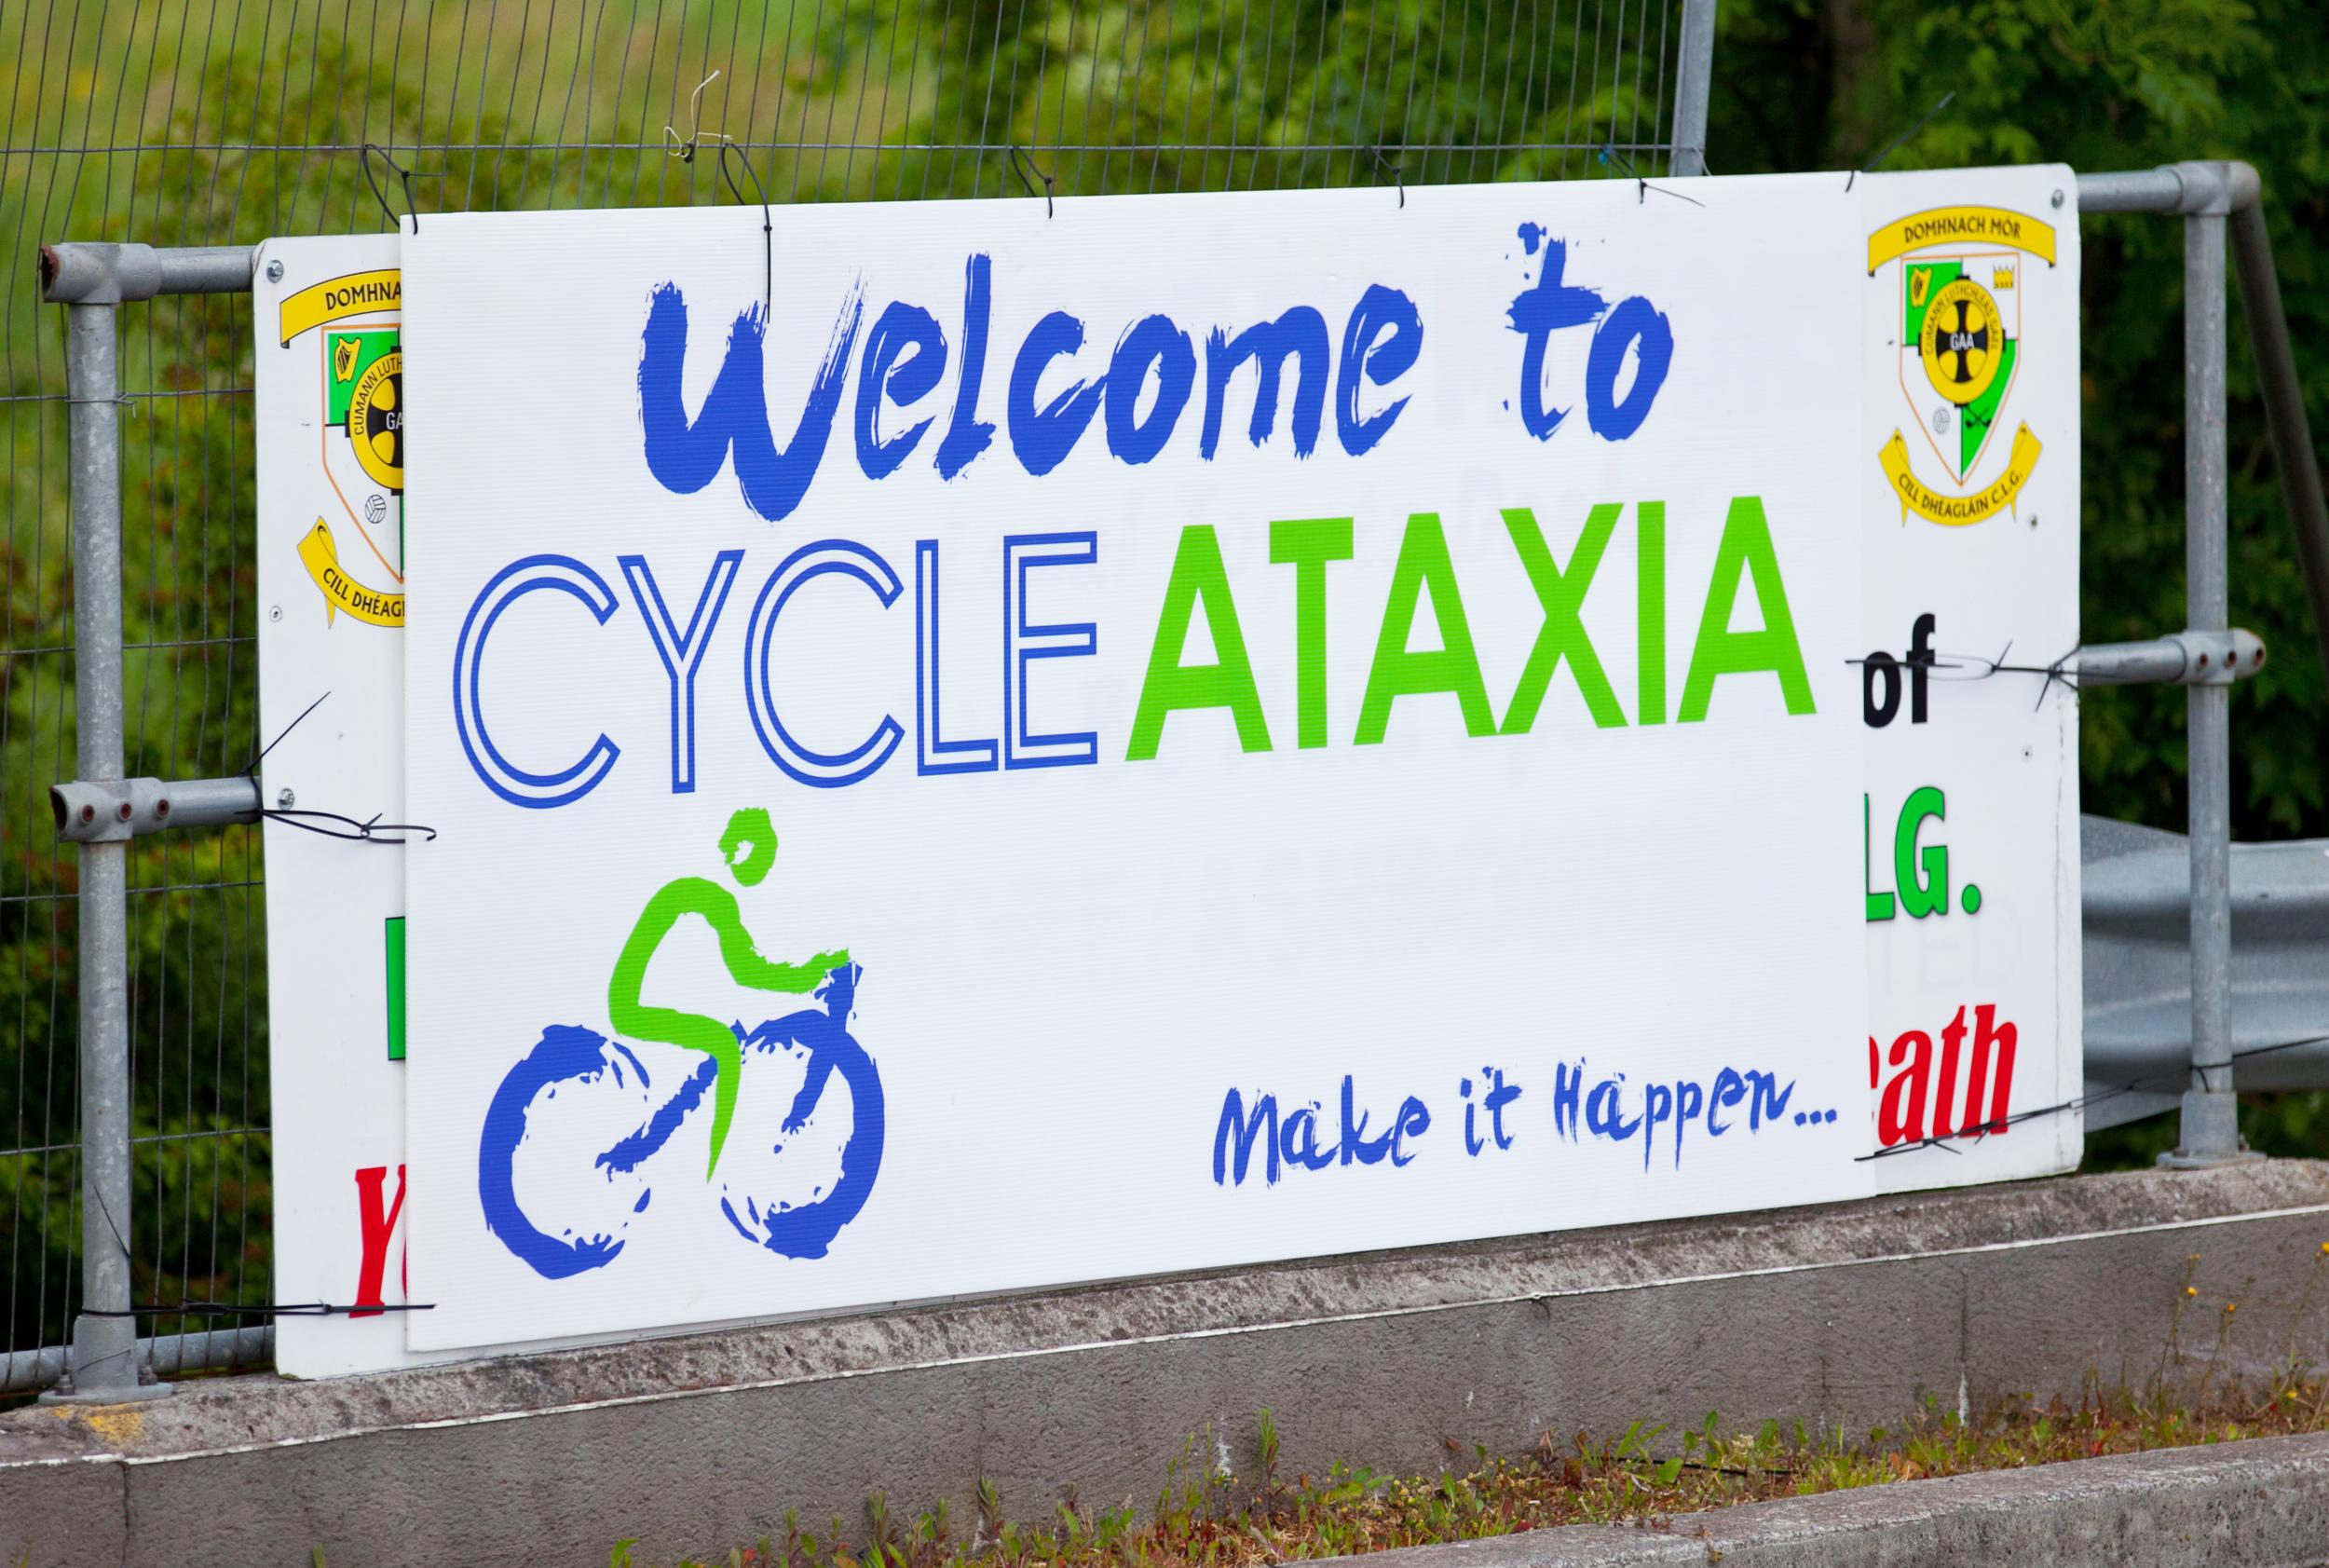 002_CycleAtaxia2015.jpg